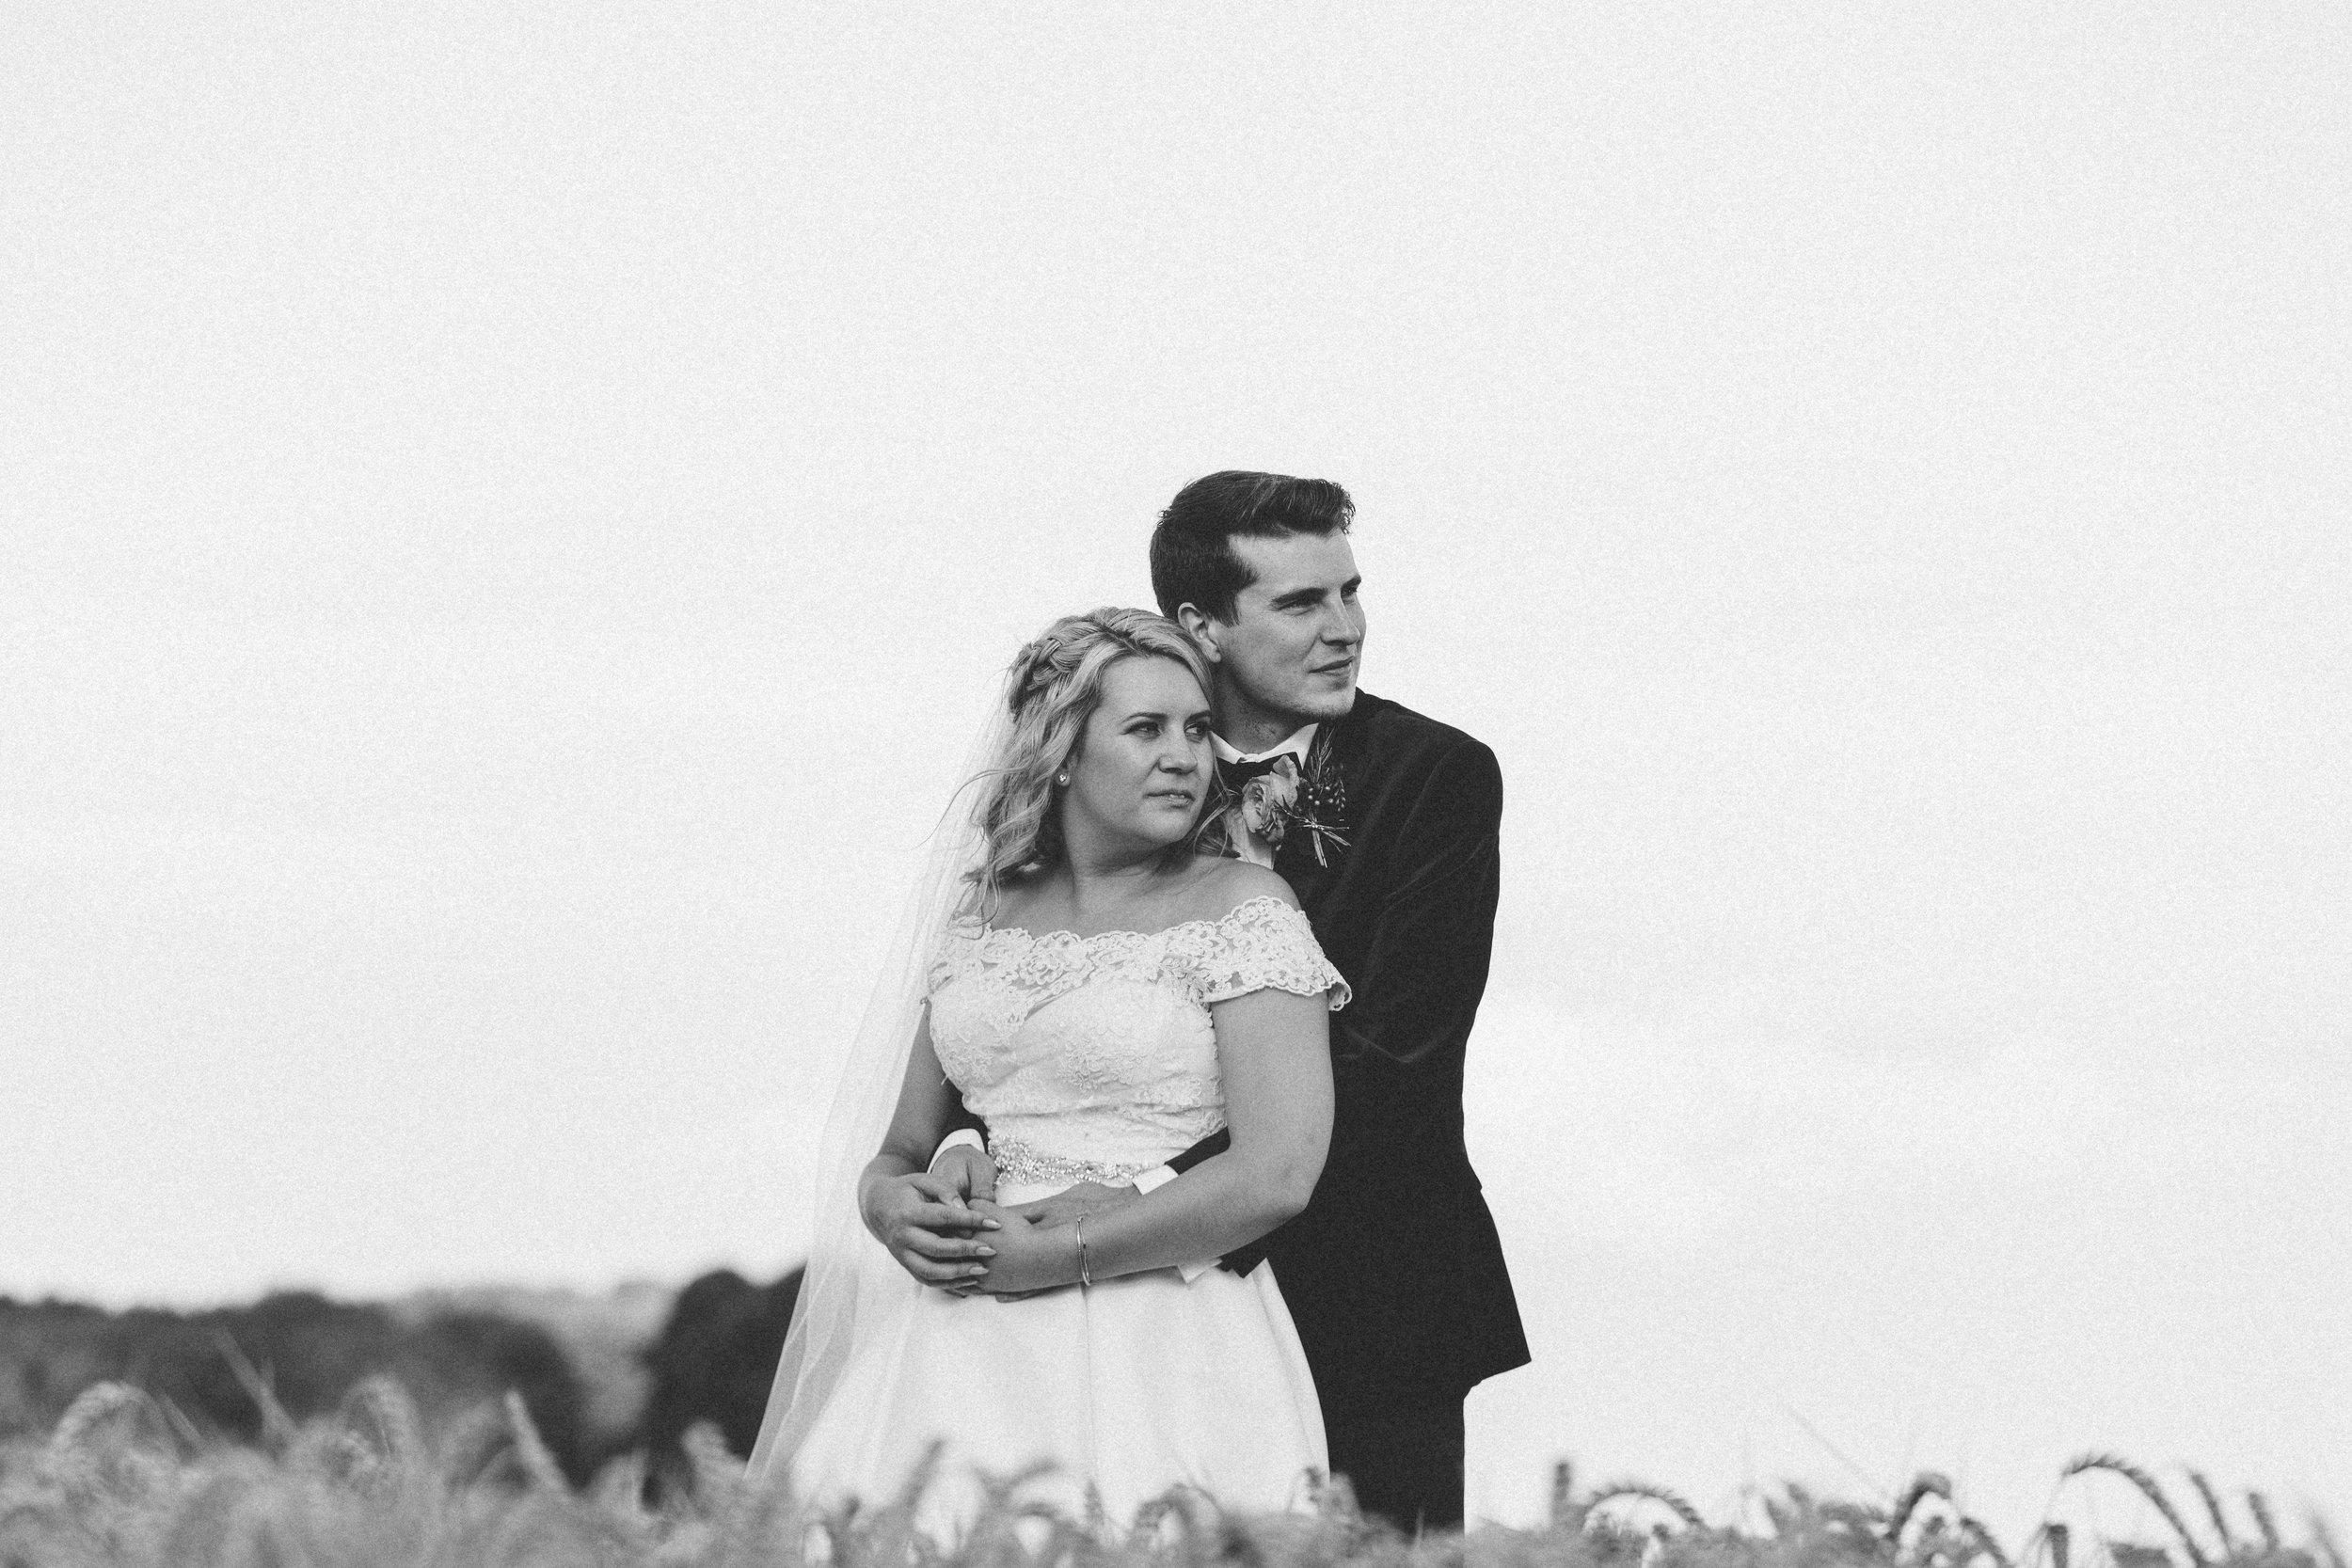 Tamara-and-Richard-Wedding-Highlights-83.jpg